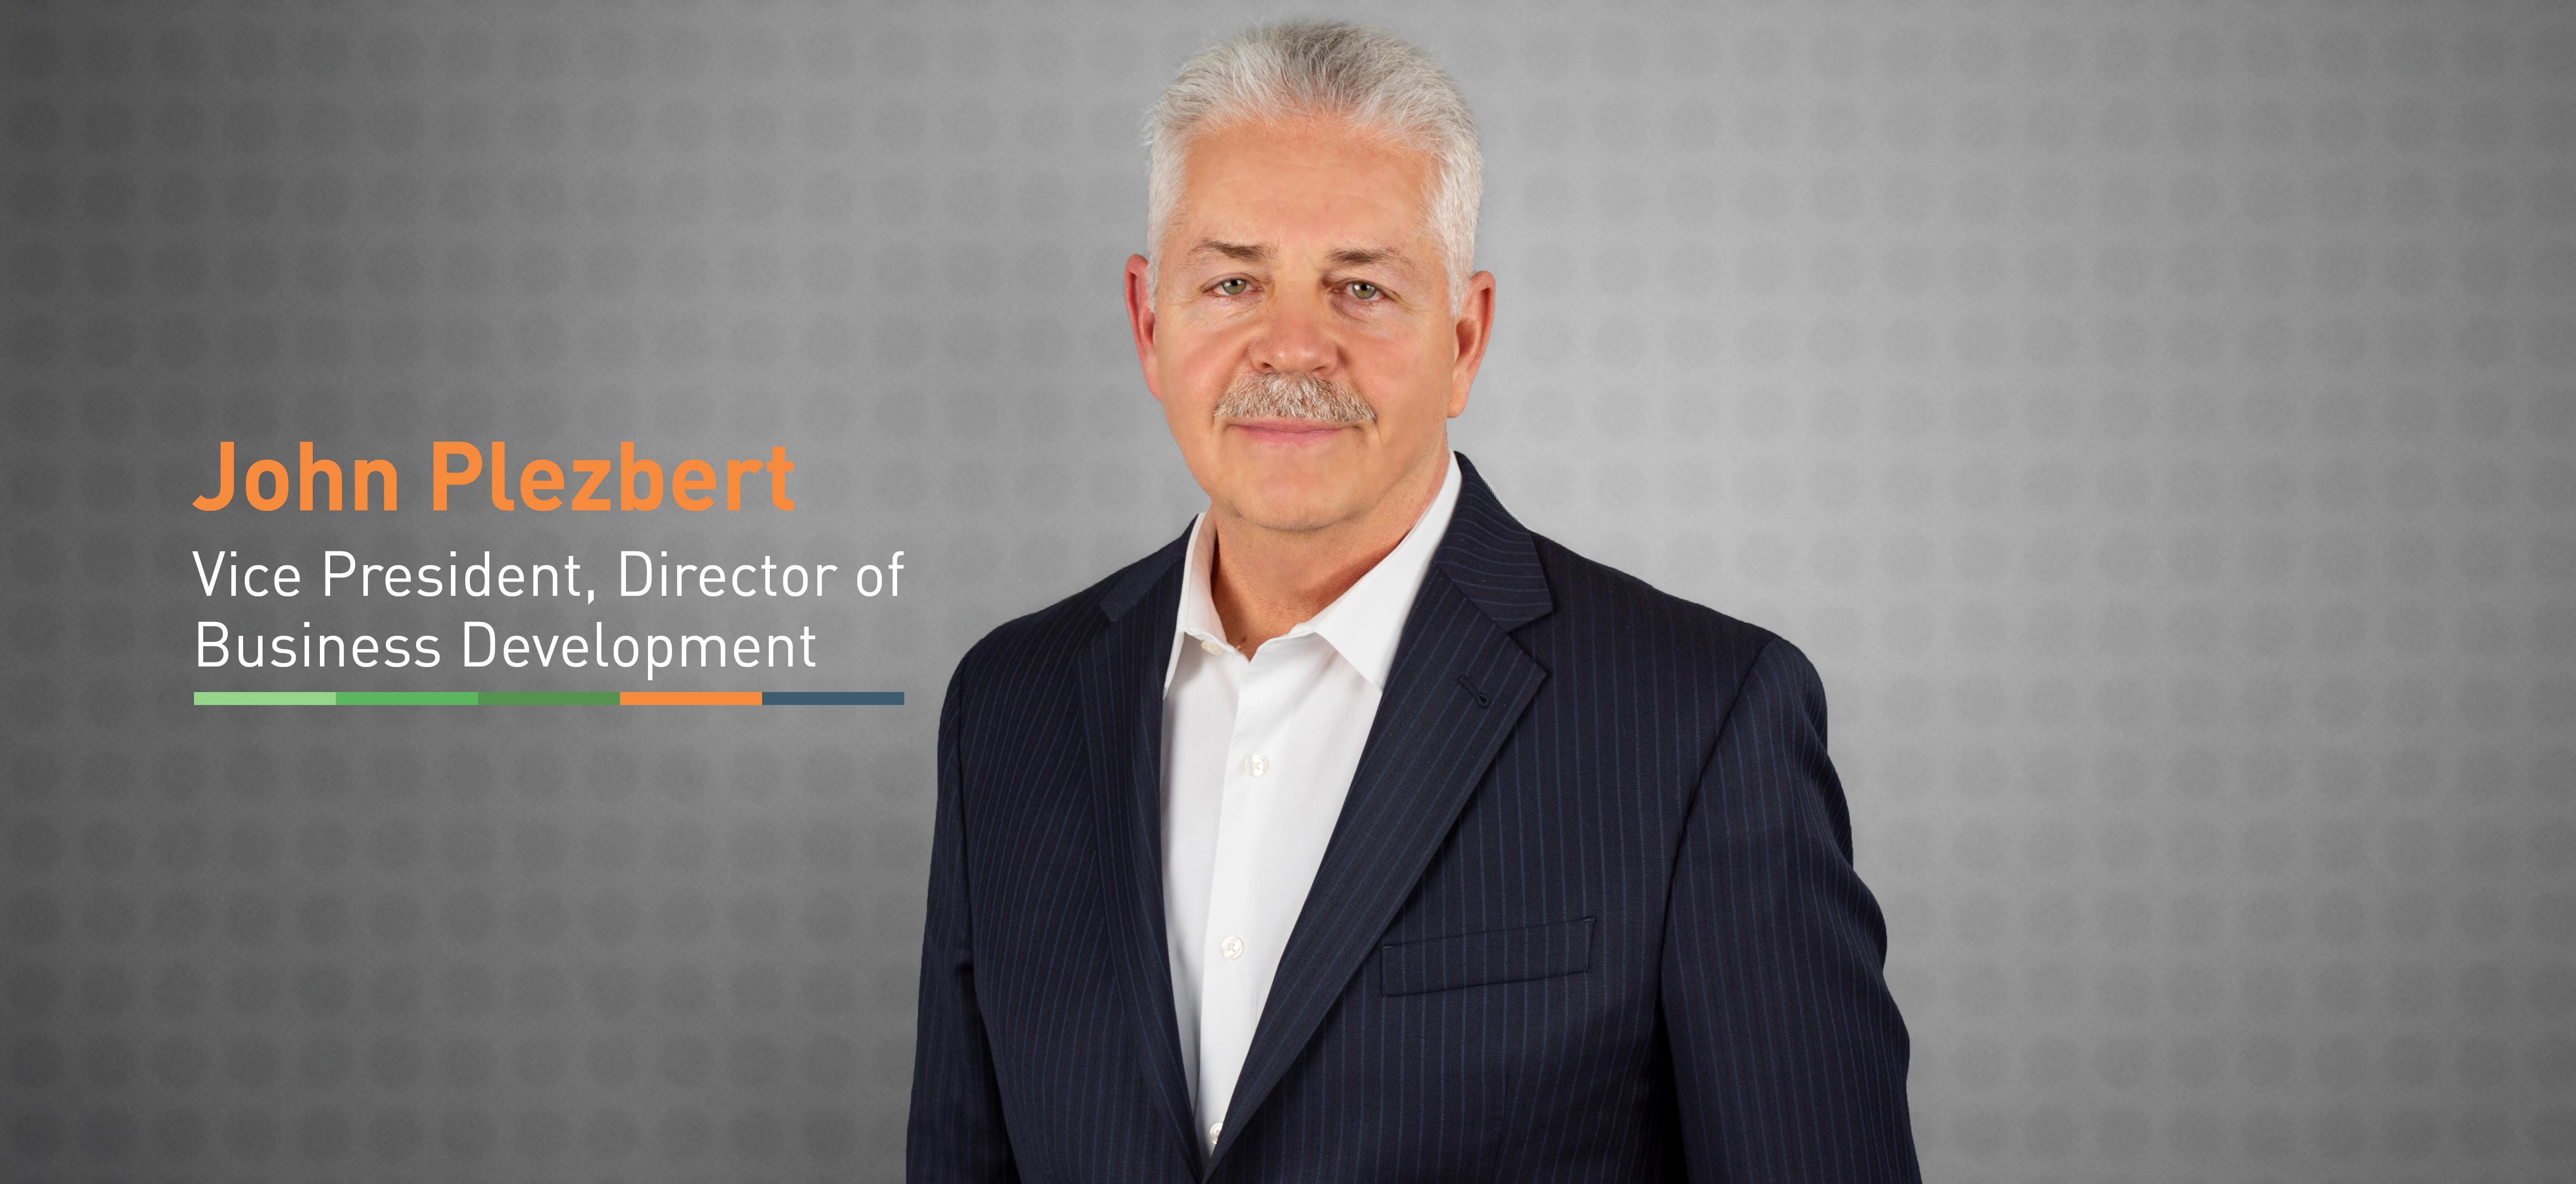 Primera Welcomes John Plezbert, Vice President, Director of Business Development